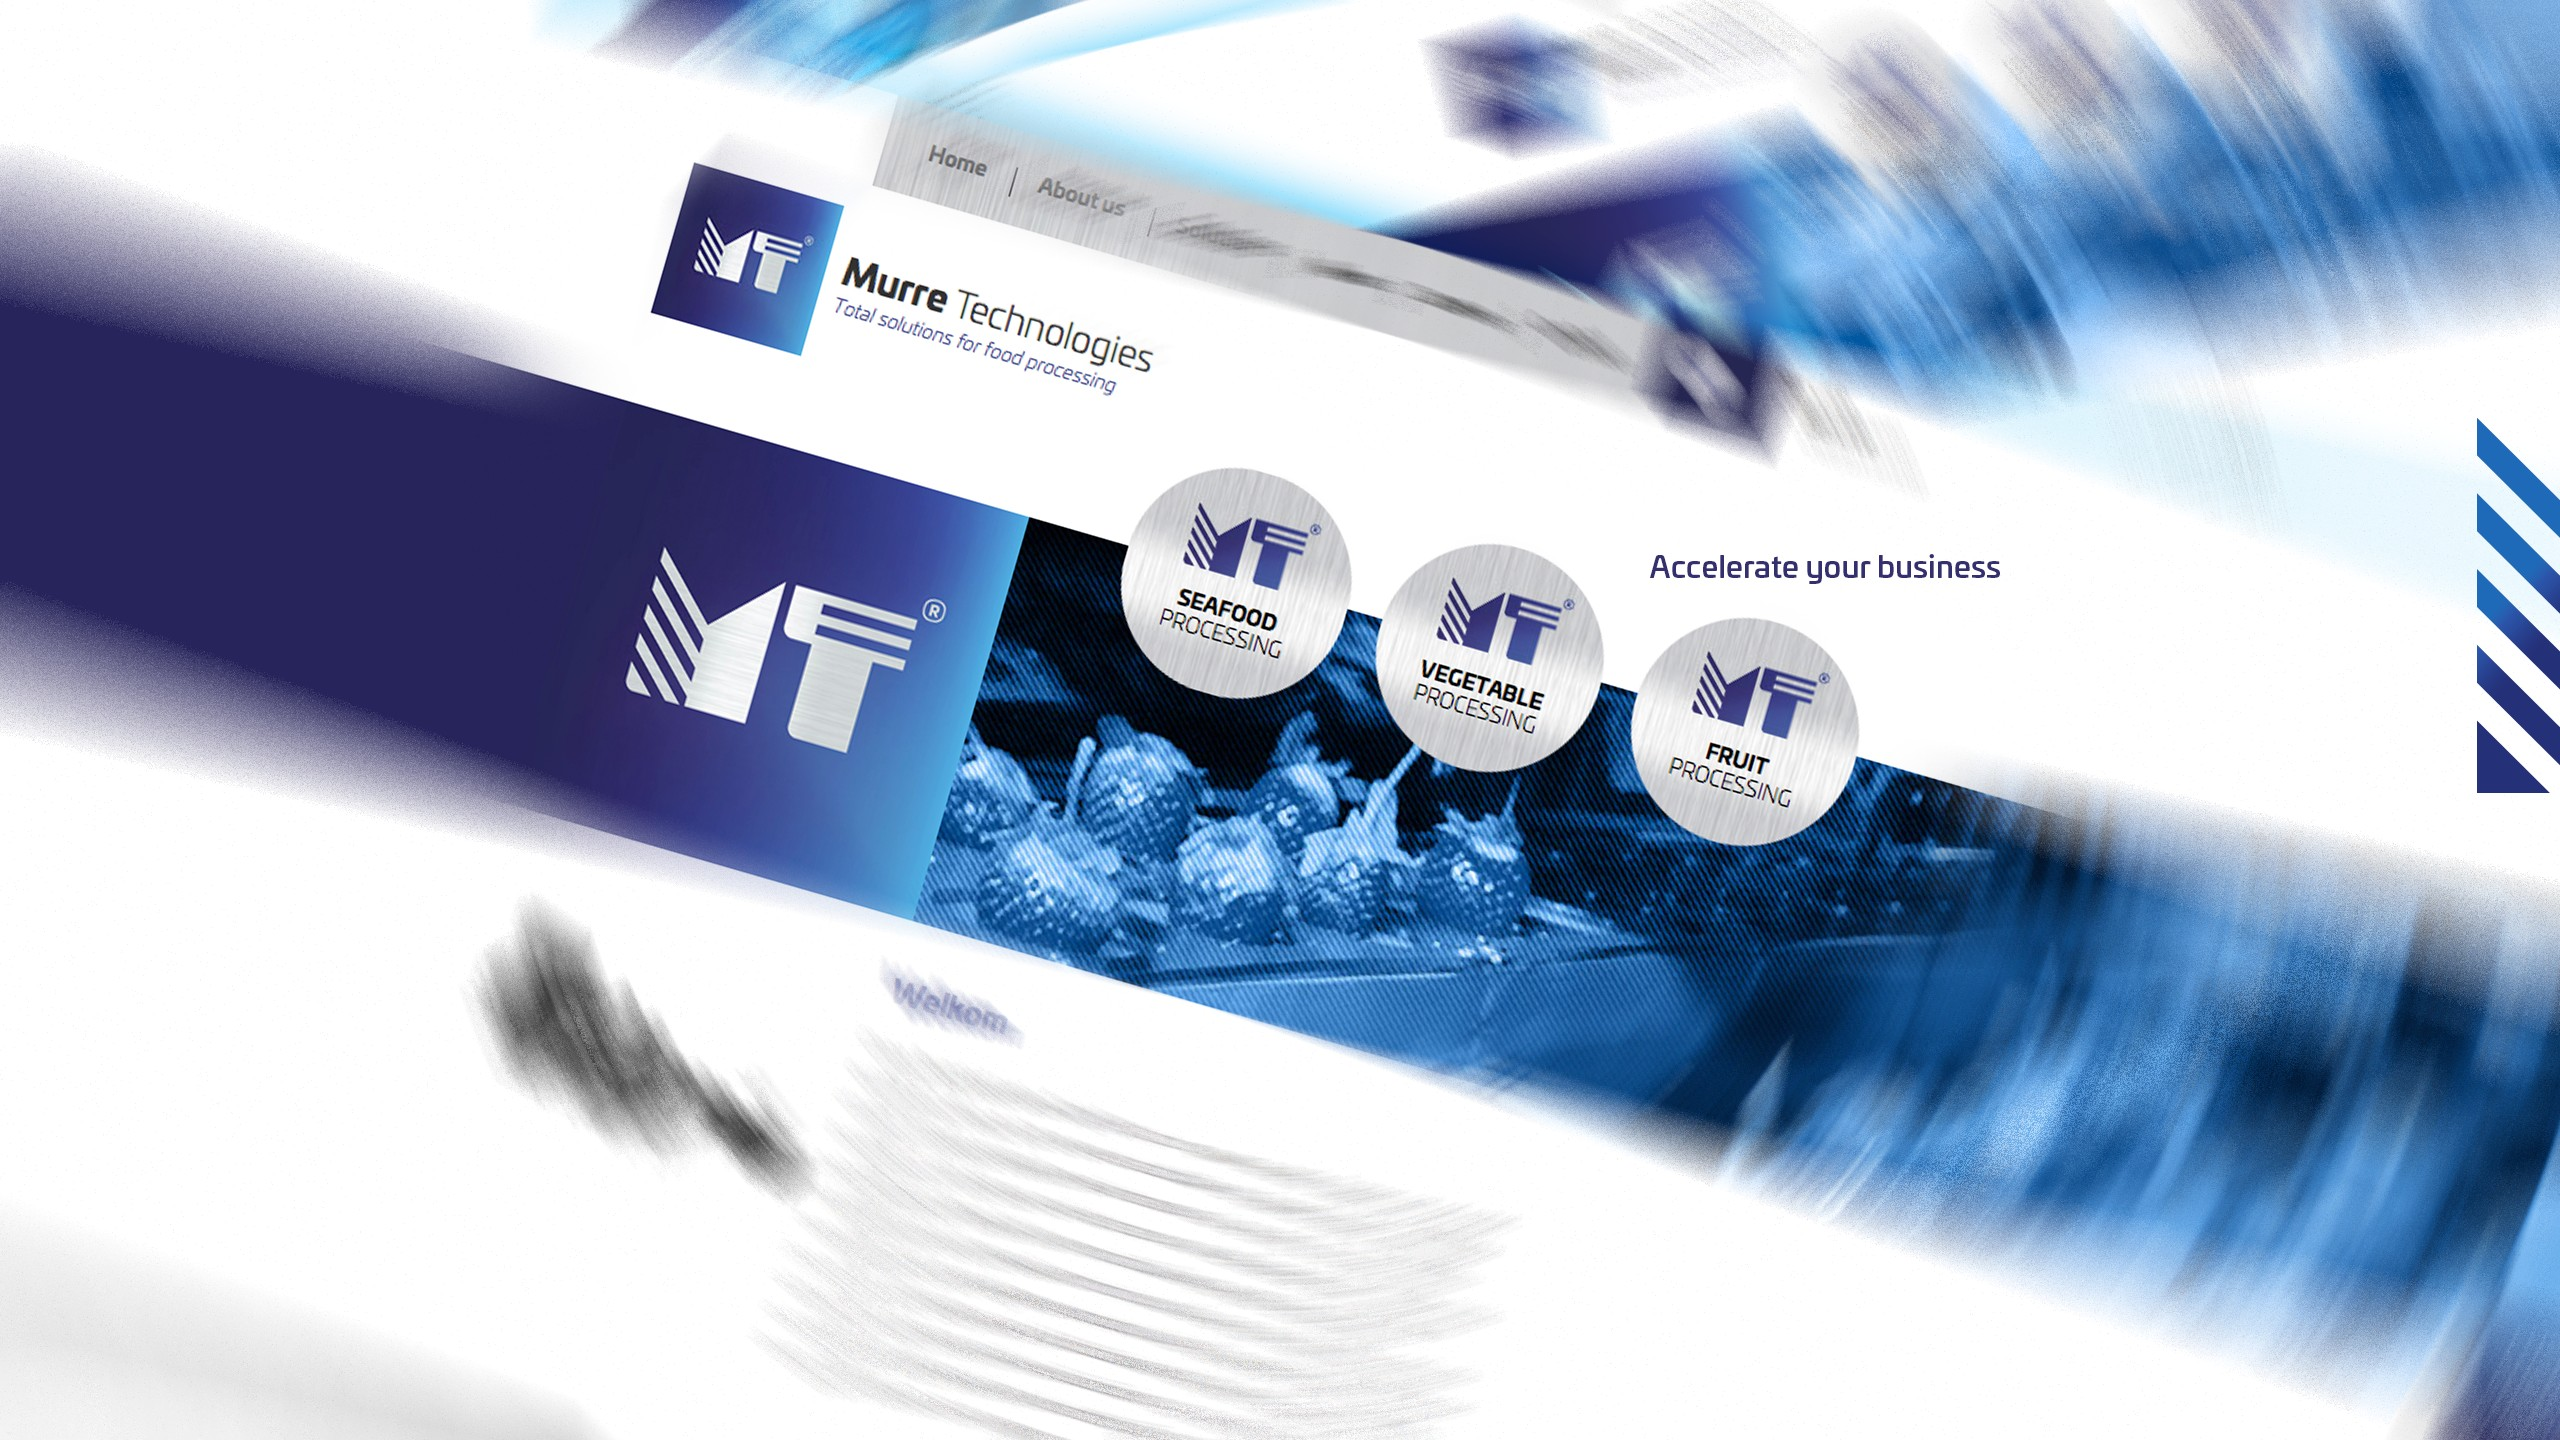 Murre Technologies Linkedin